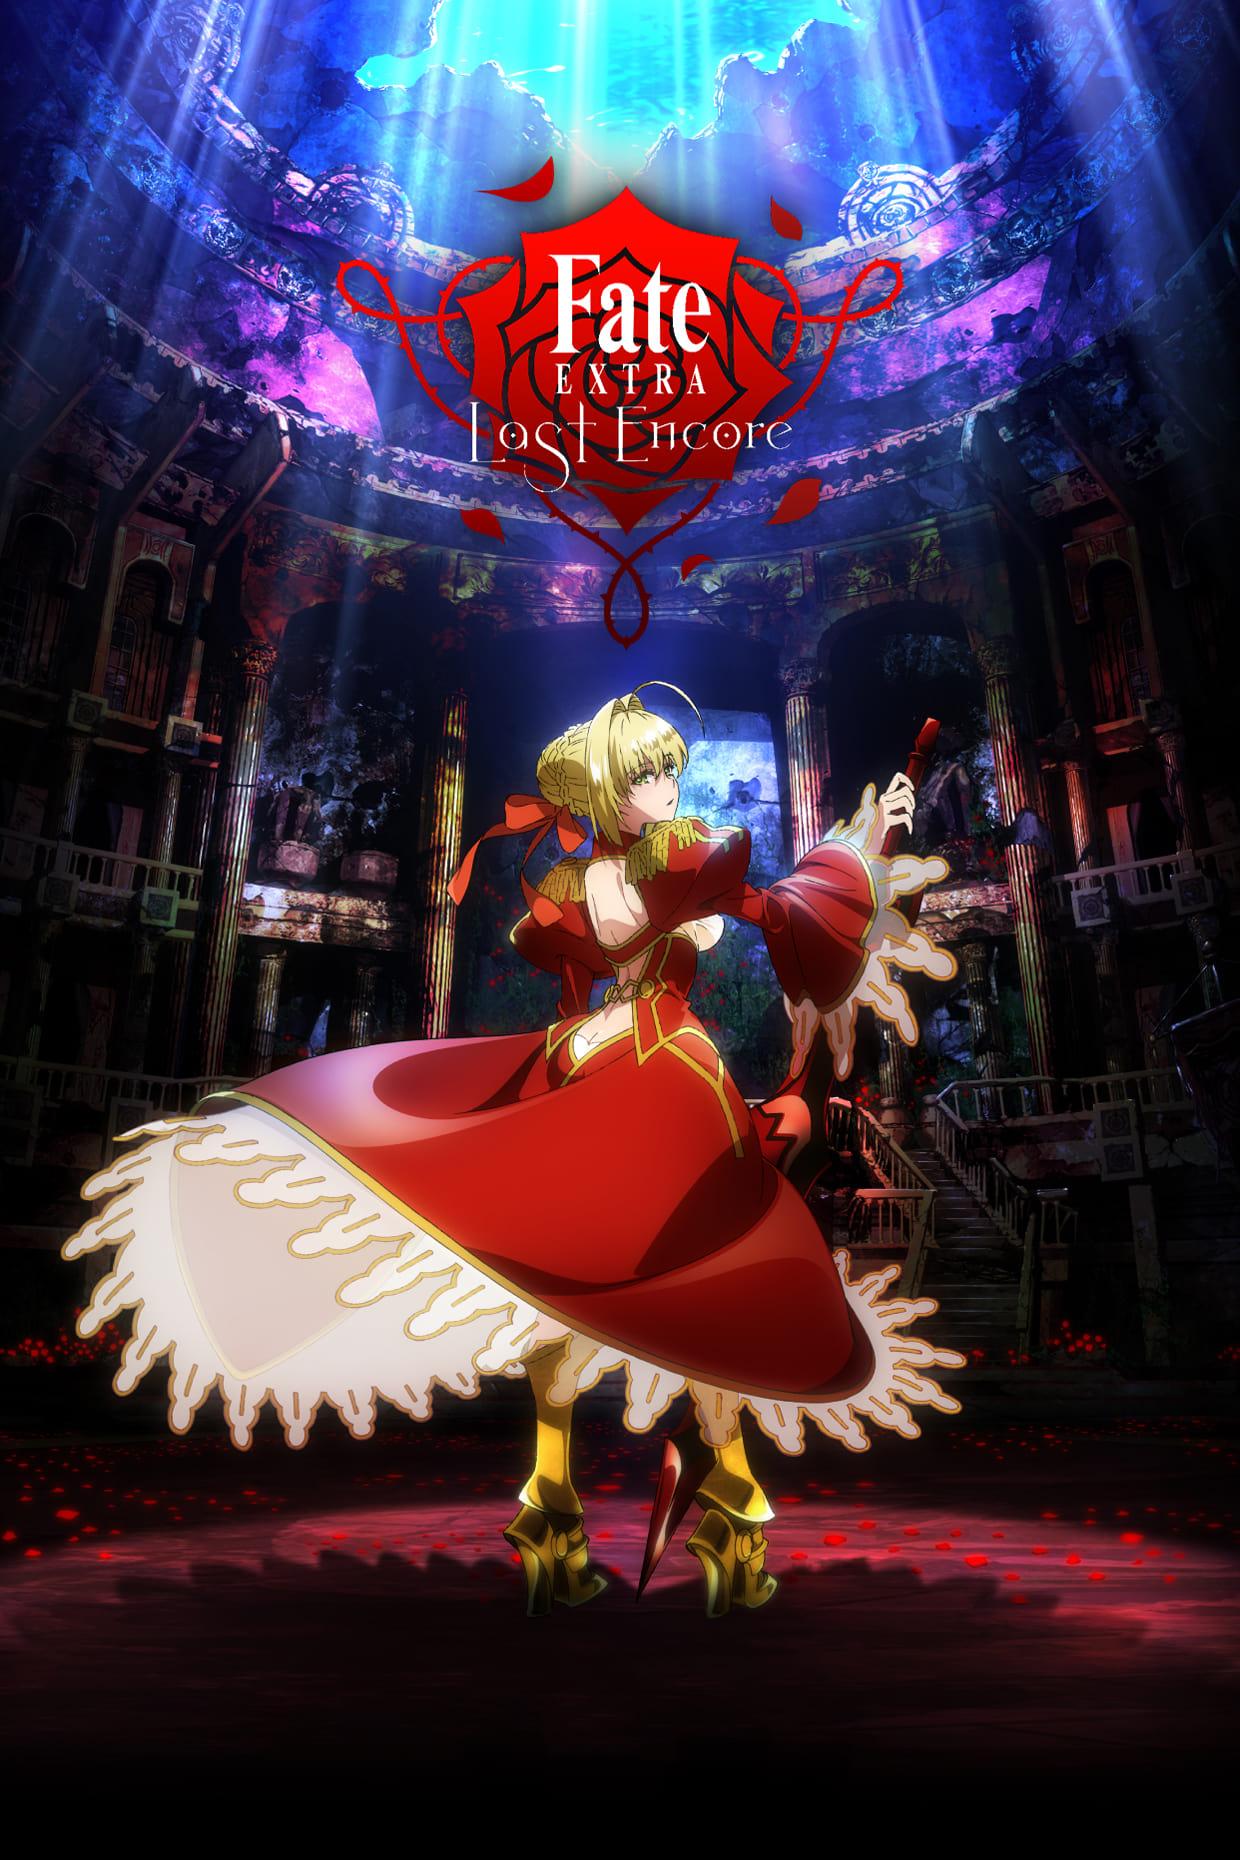 Fate/EXTRA: Last Encore (2018)